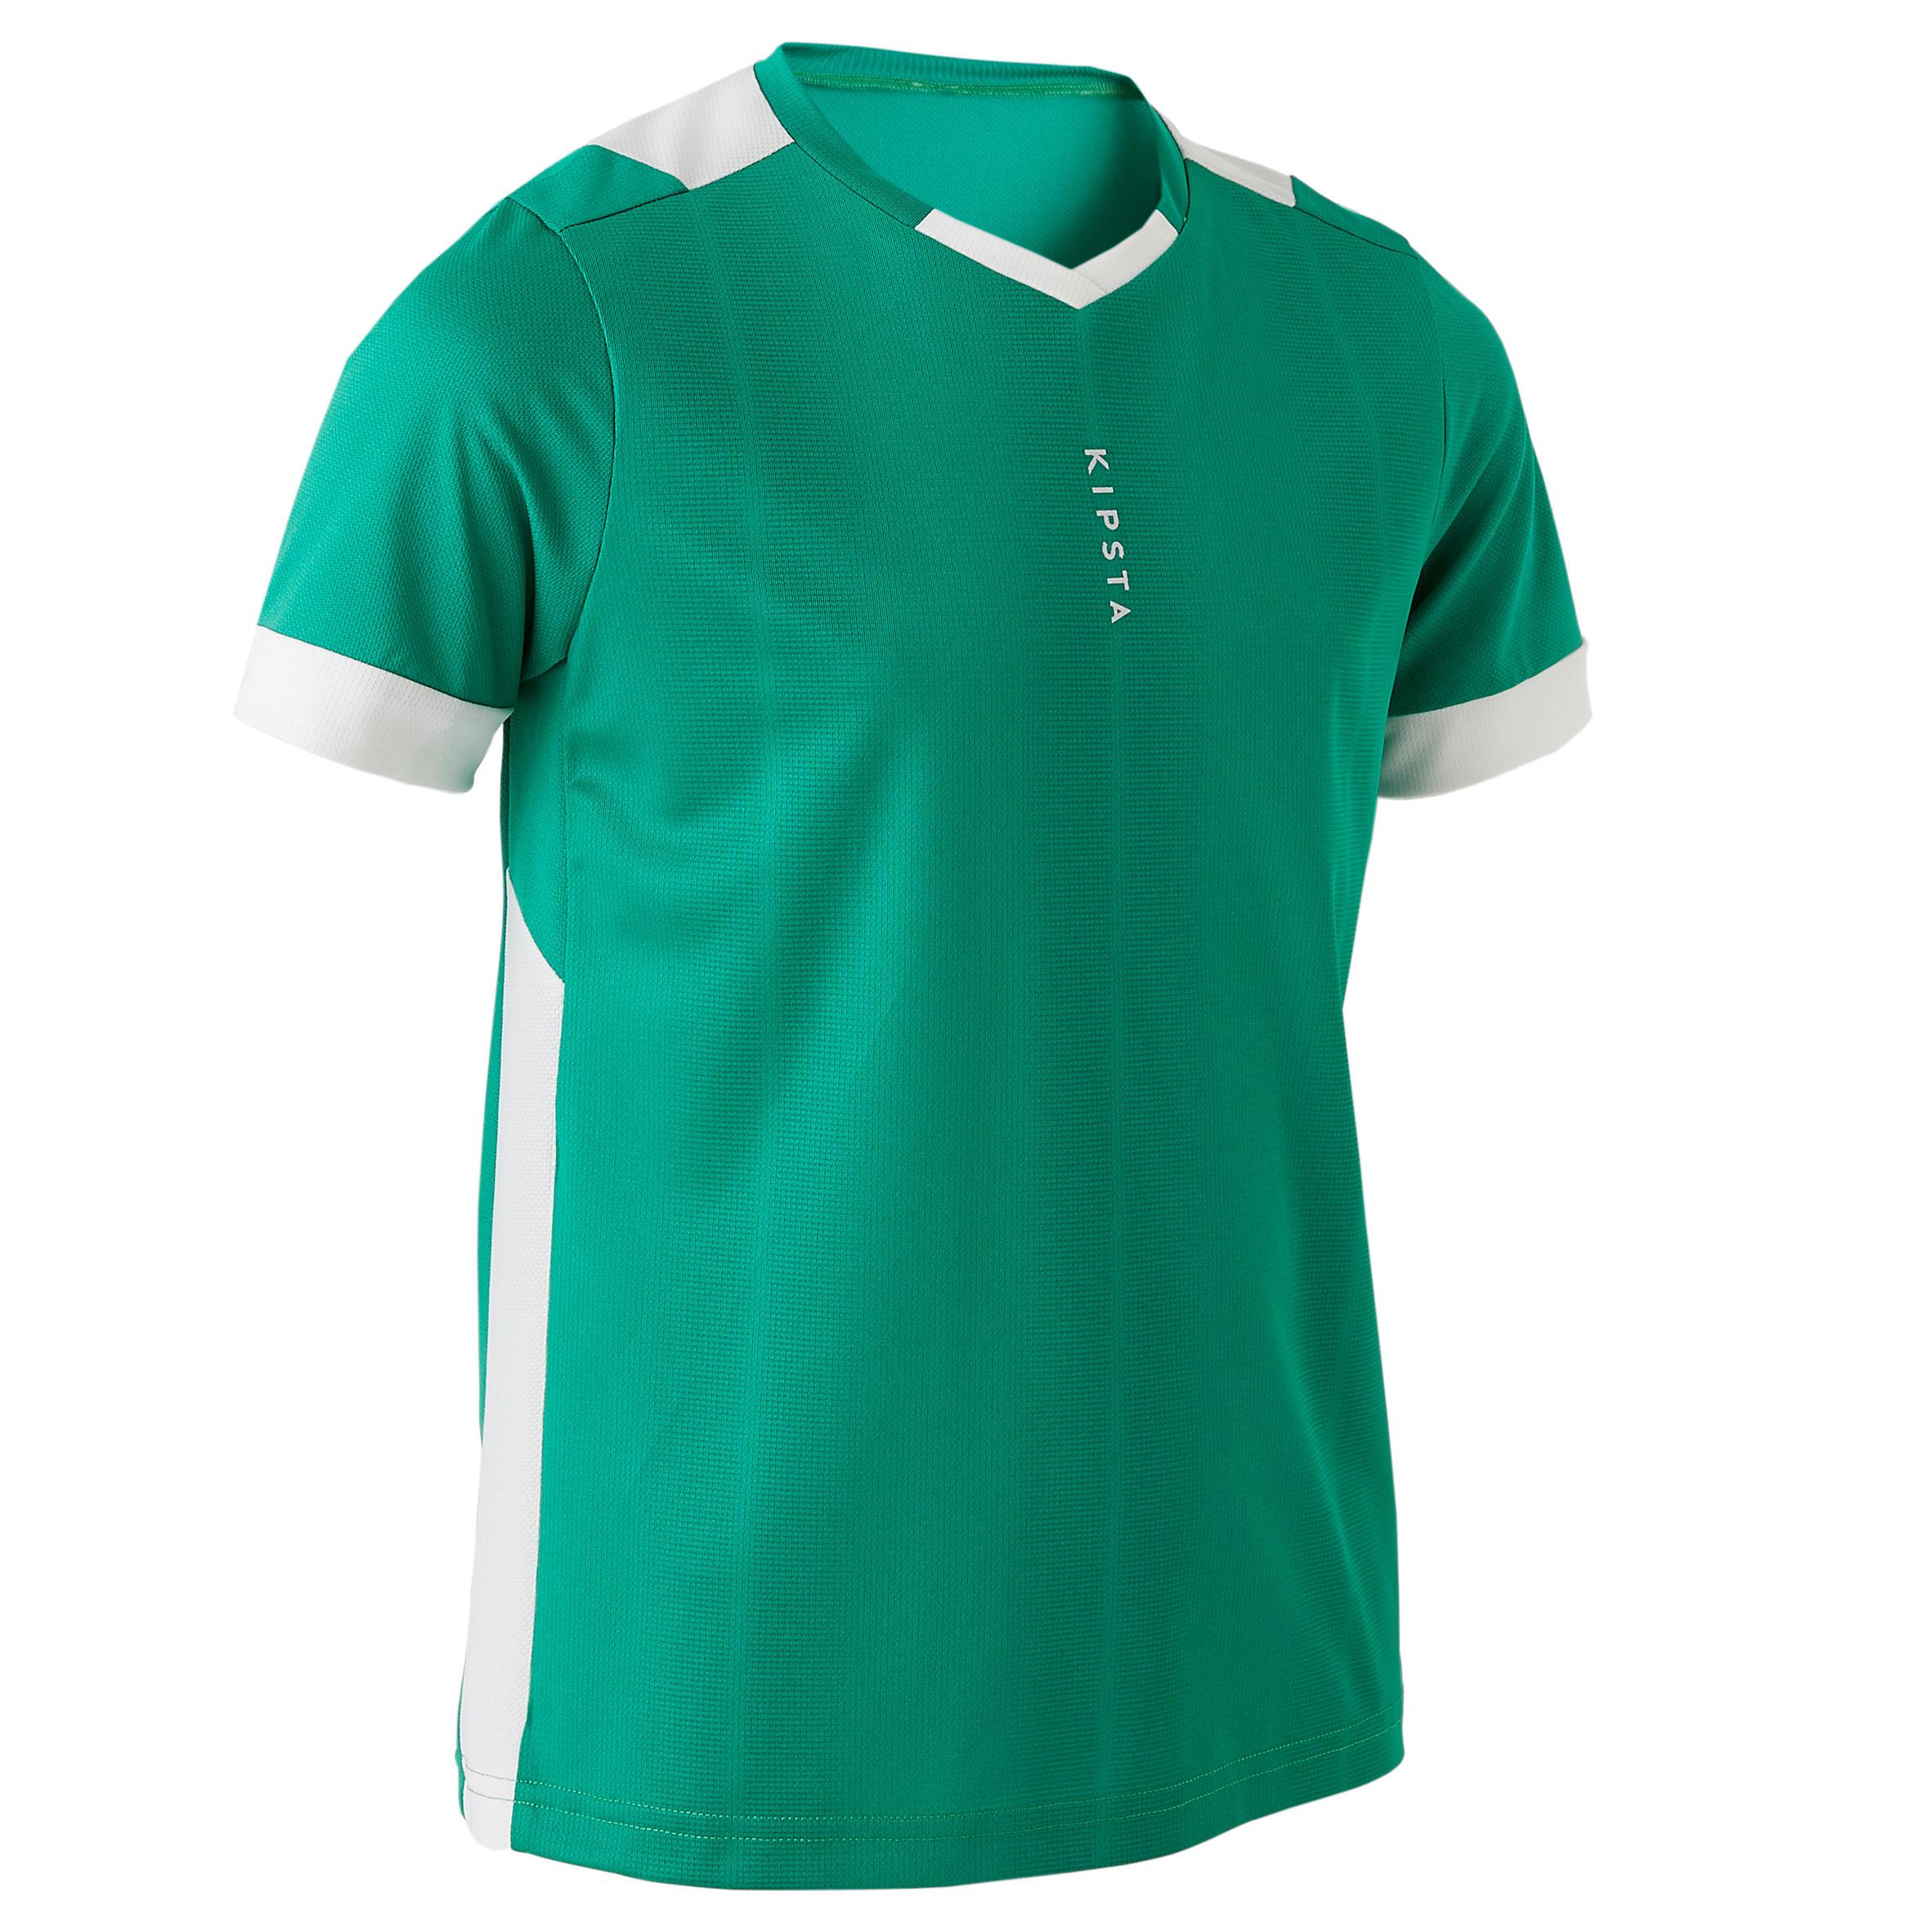 Kipsta Voetbalshirt kind F500 groen/wit